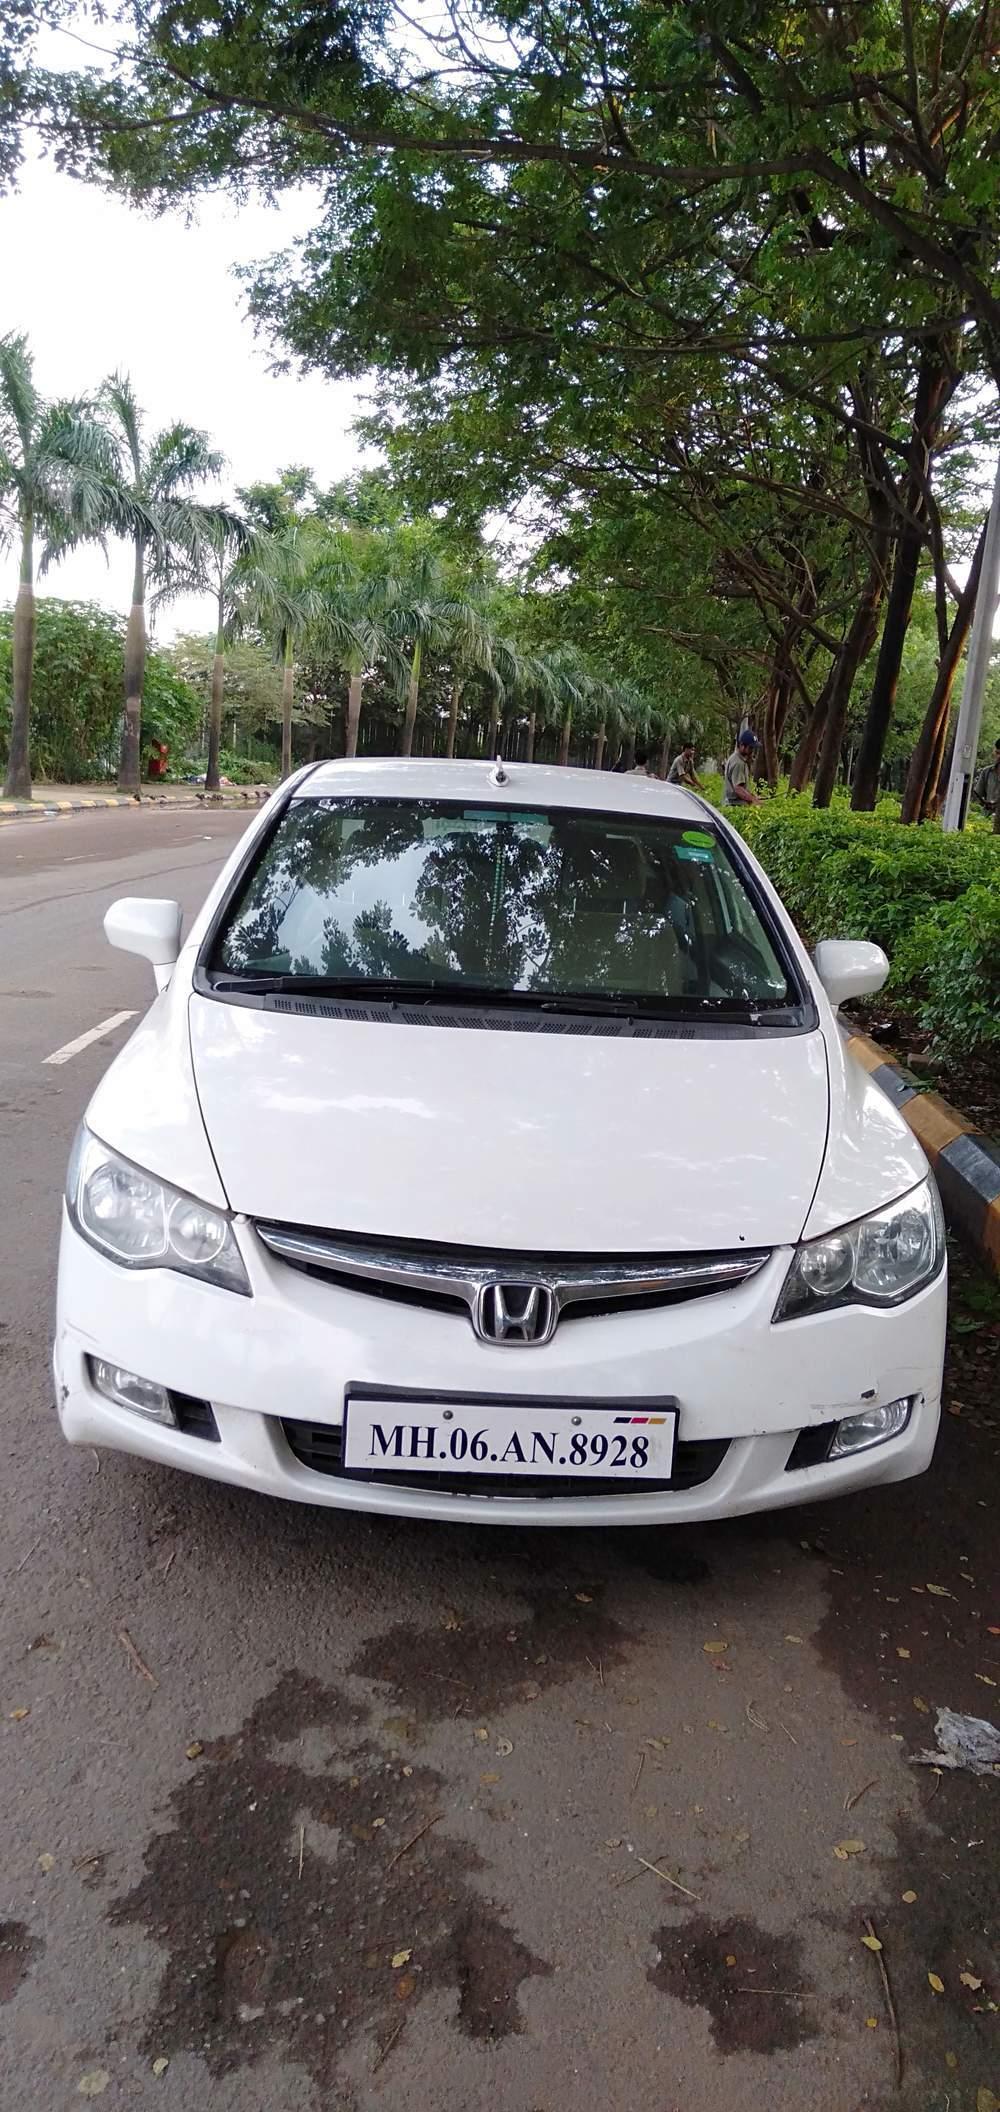 2019 Honda Civic Rear Left Side Angle View